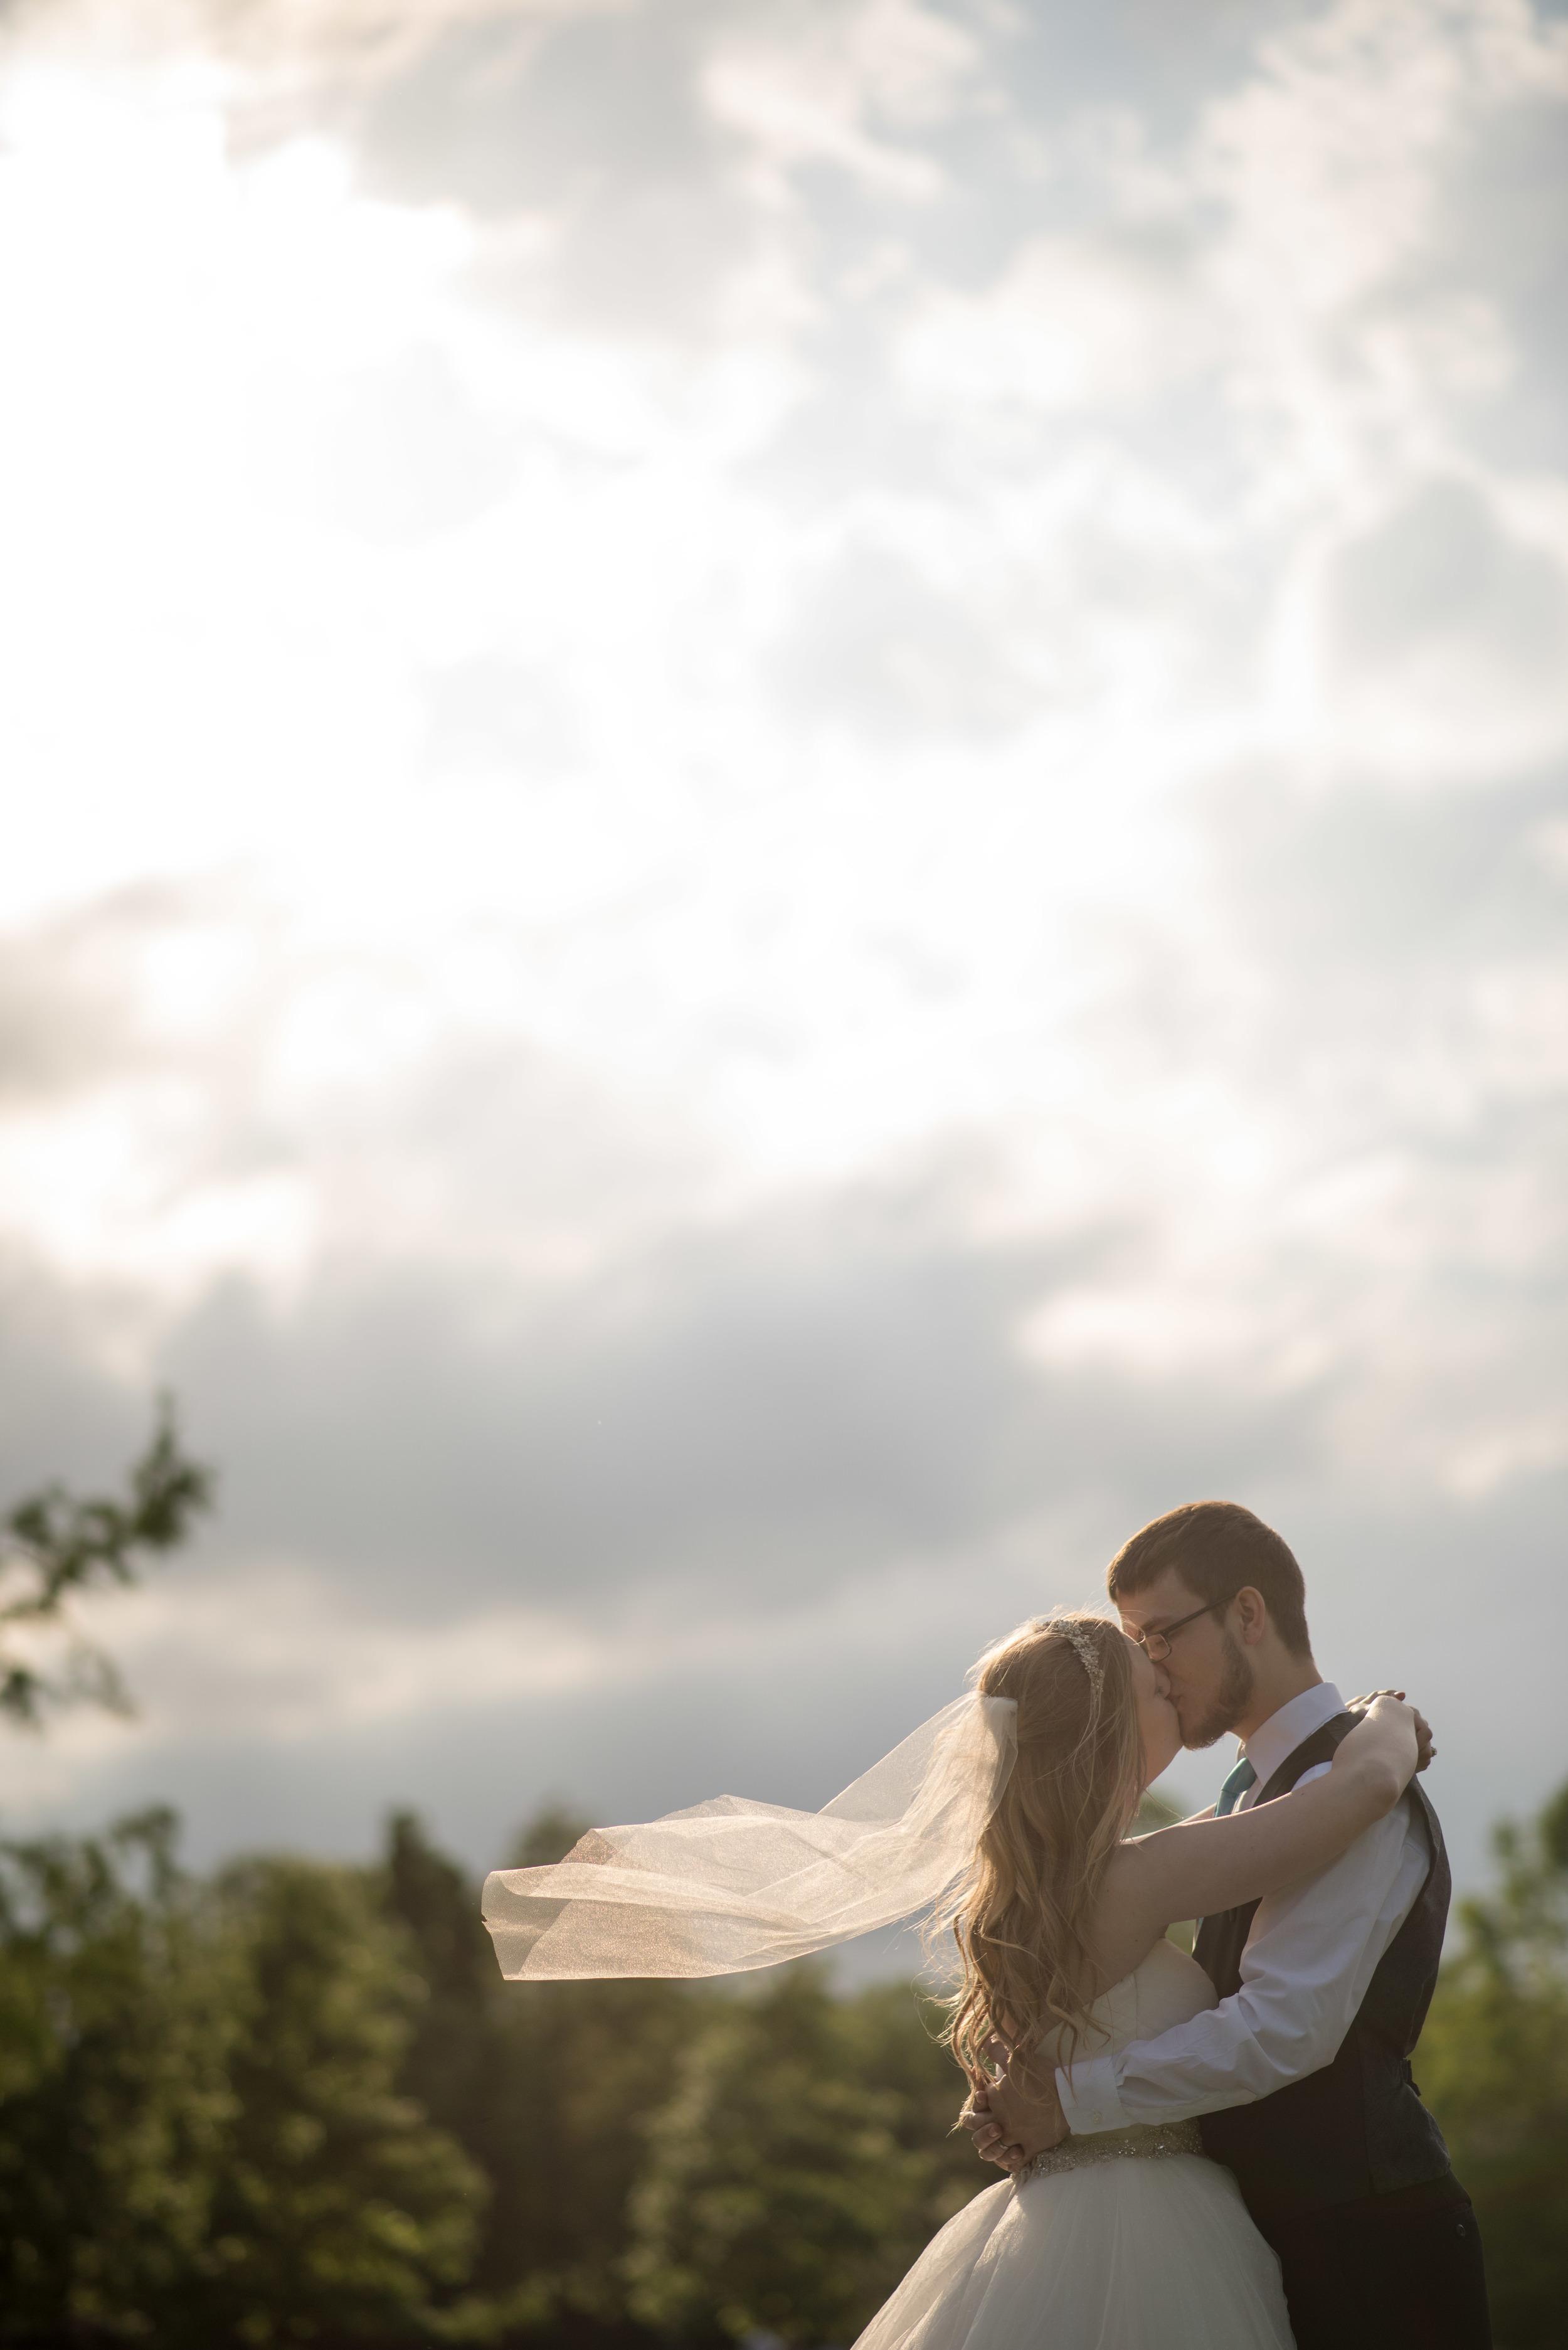 Stephen+Grace Wedding-57.jpg